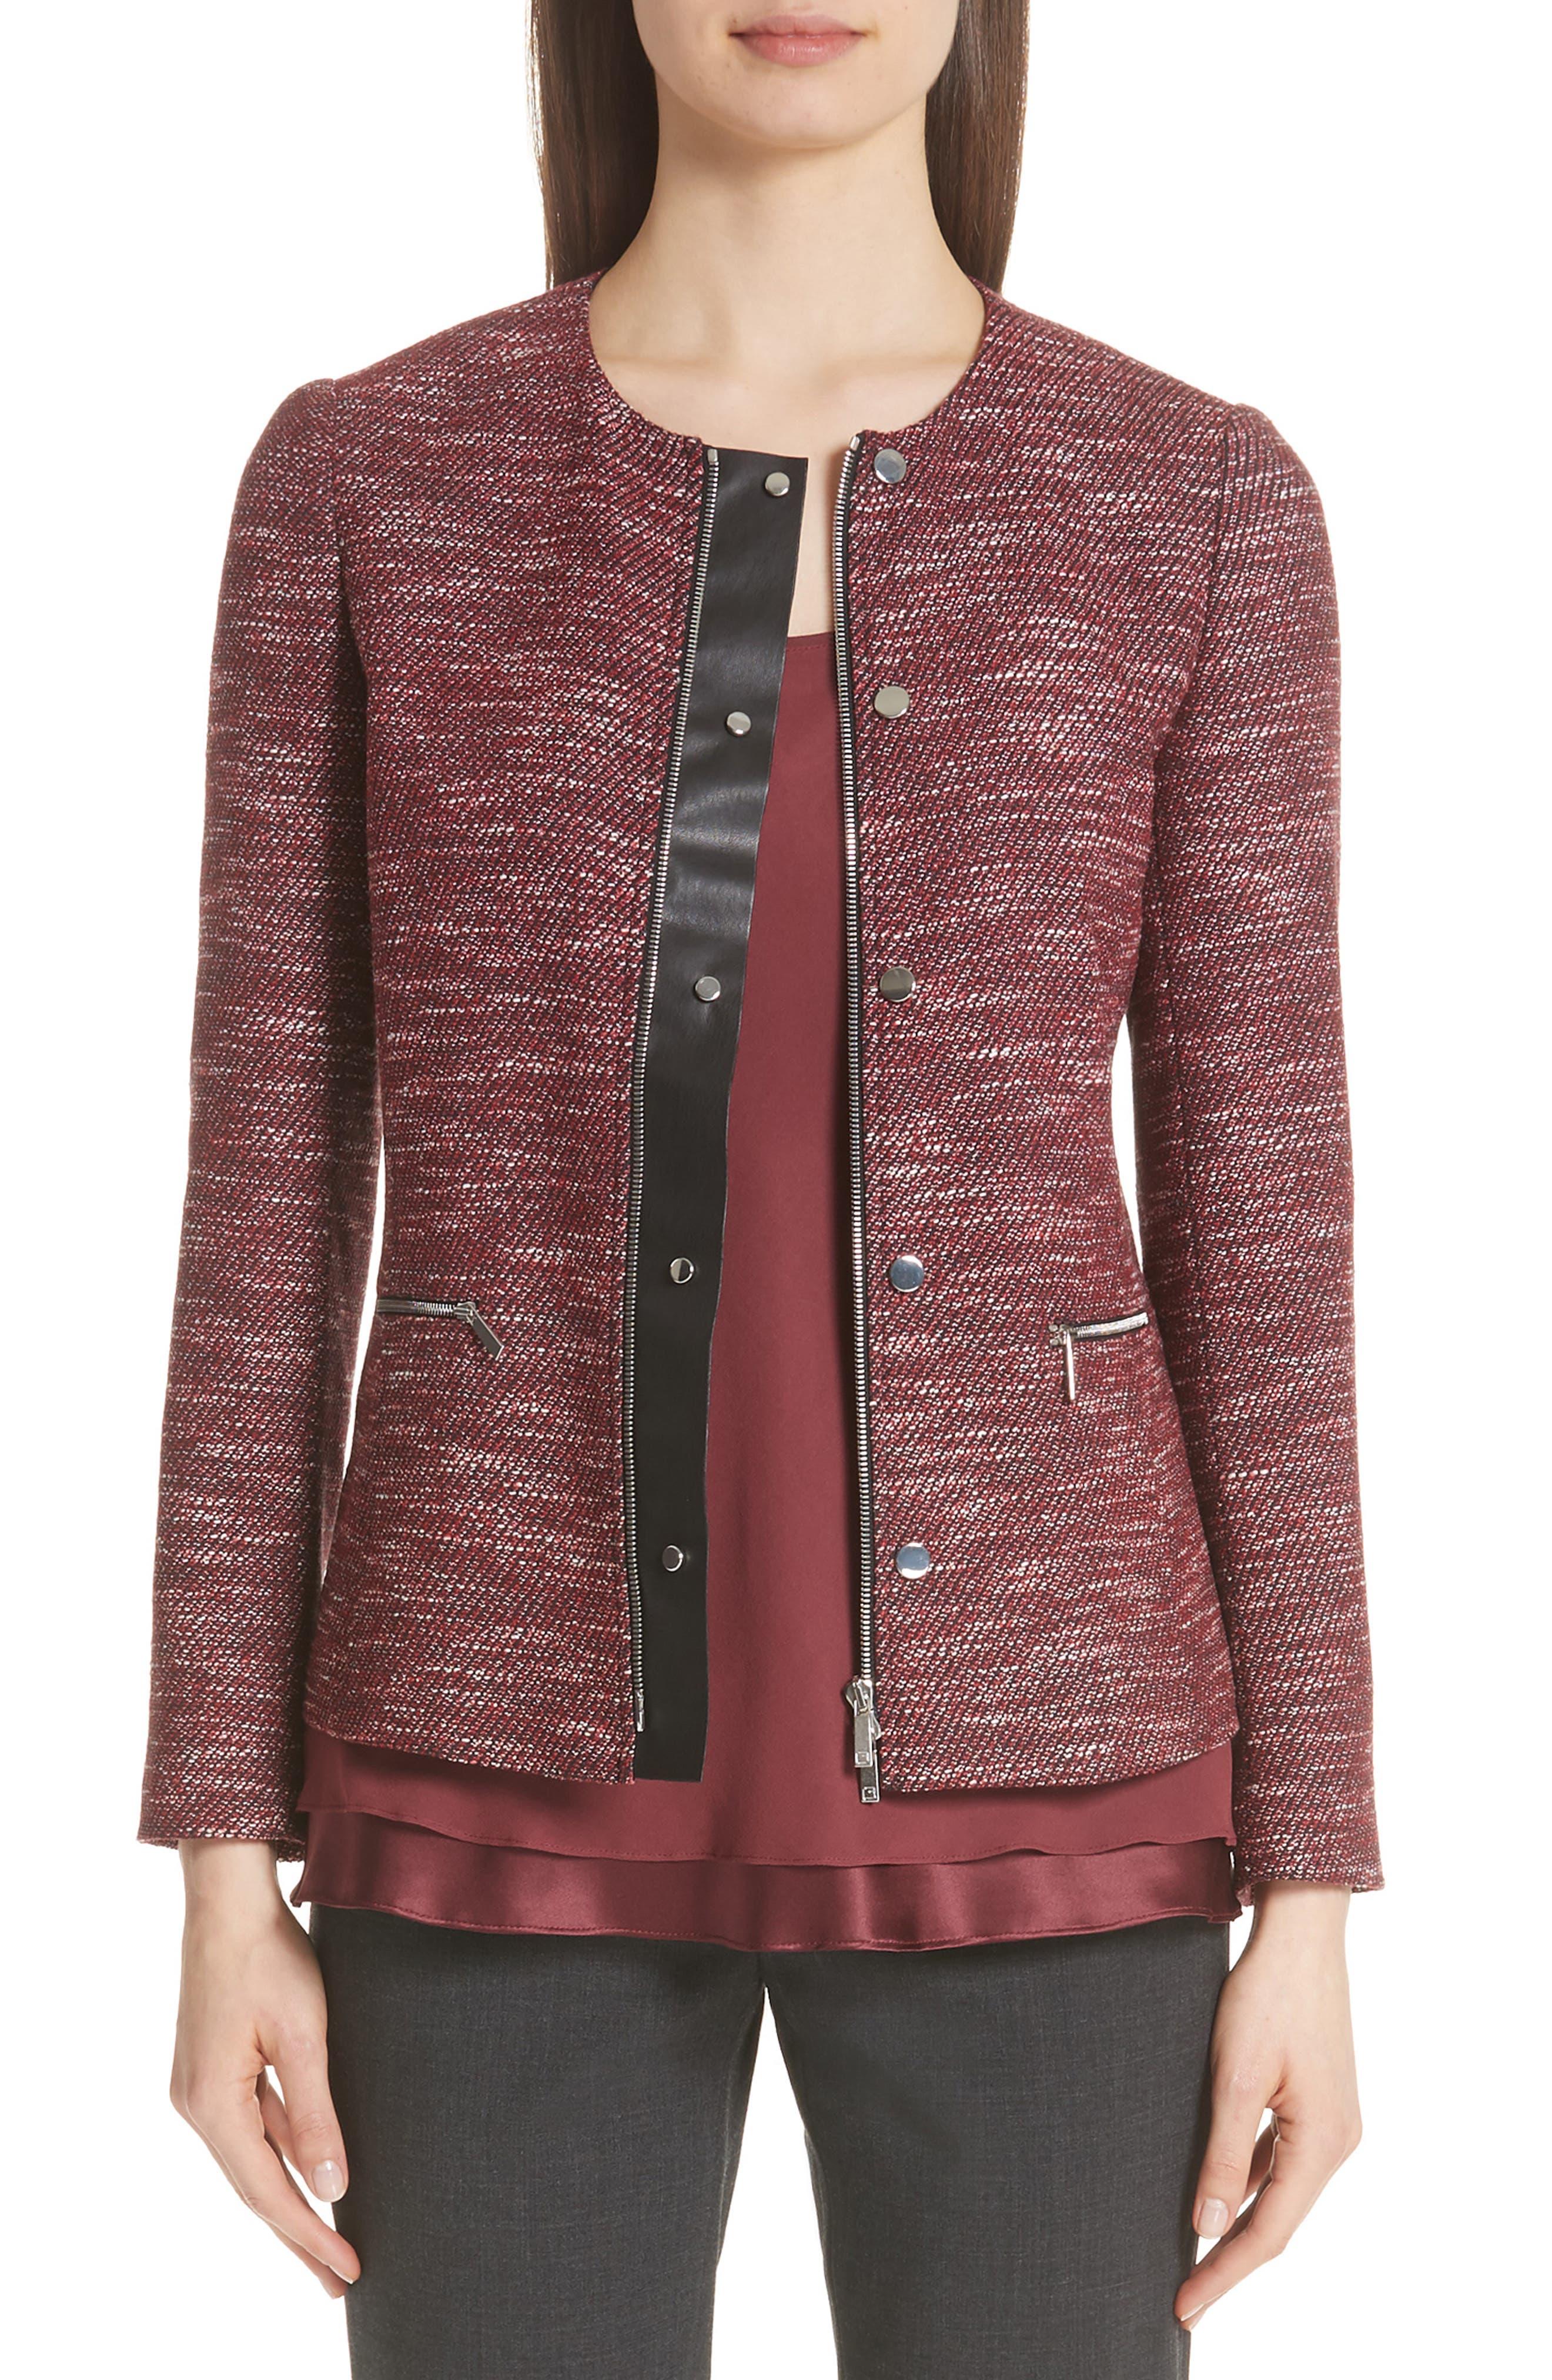 LAFAYETTE 148 NEW YORK,                             Kerrington Wool Blend Jacket,                             Main thumbnail 1, color,                             930